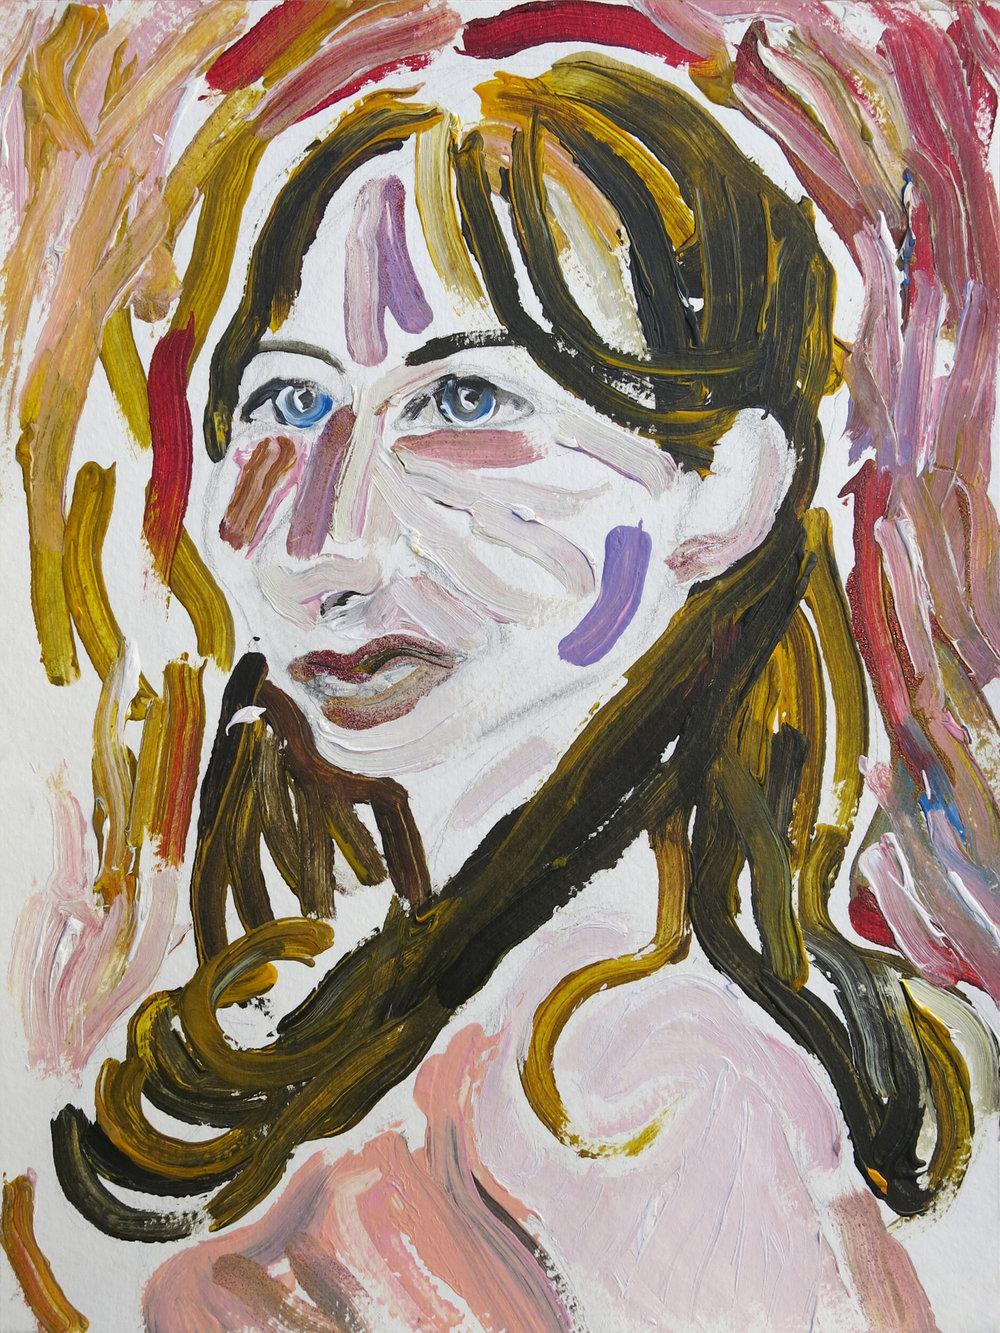 Barbra Streisand Portrait #77